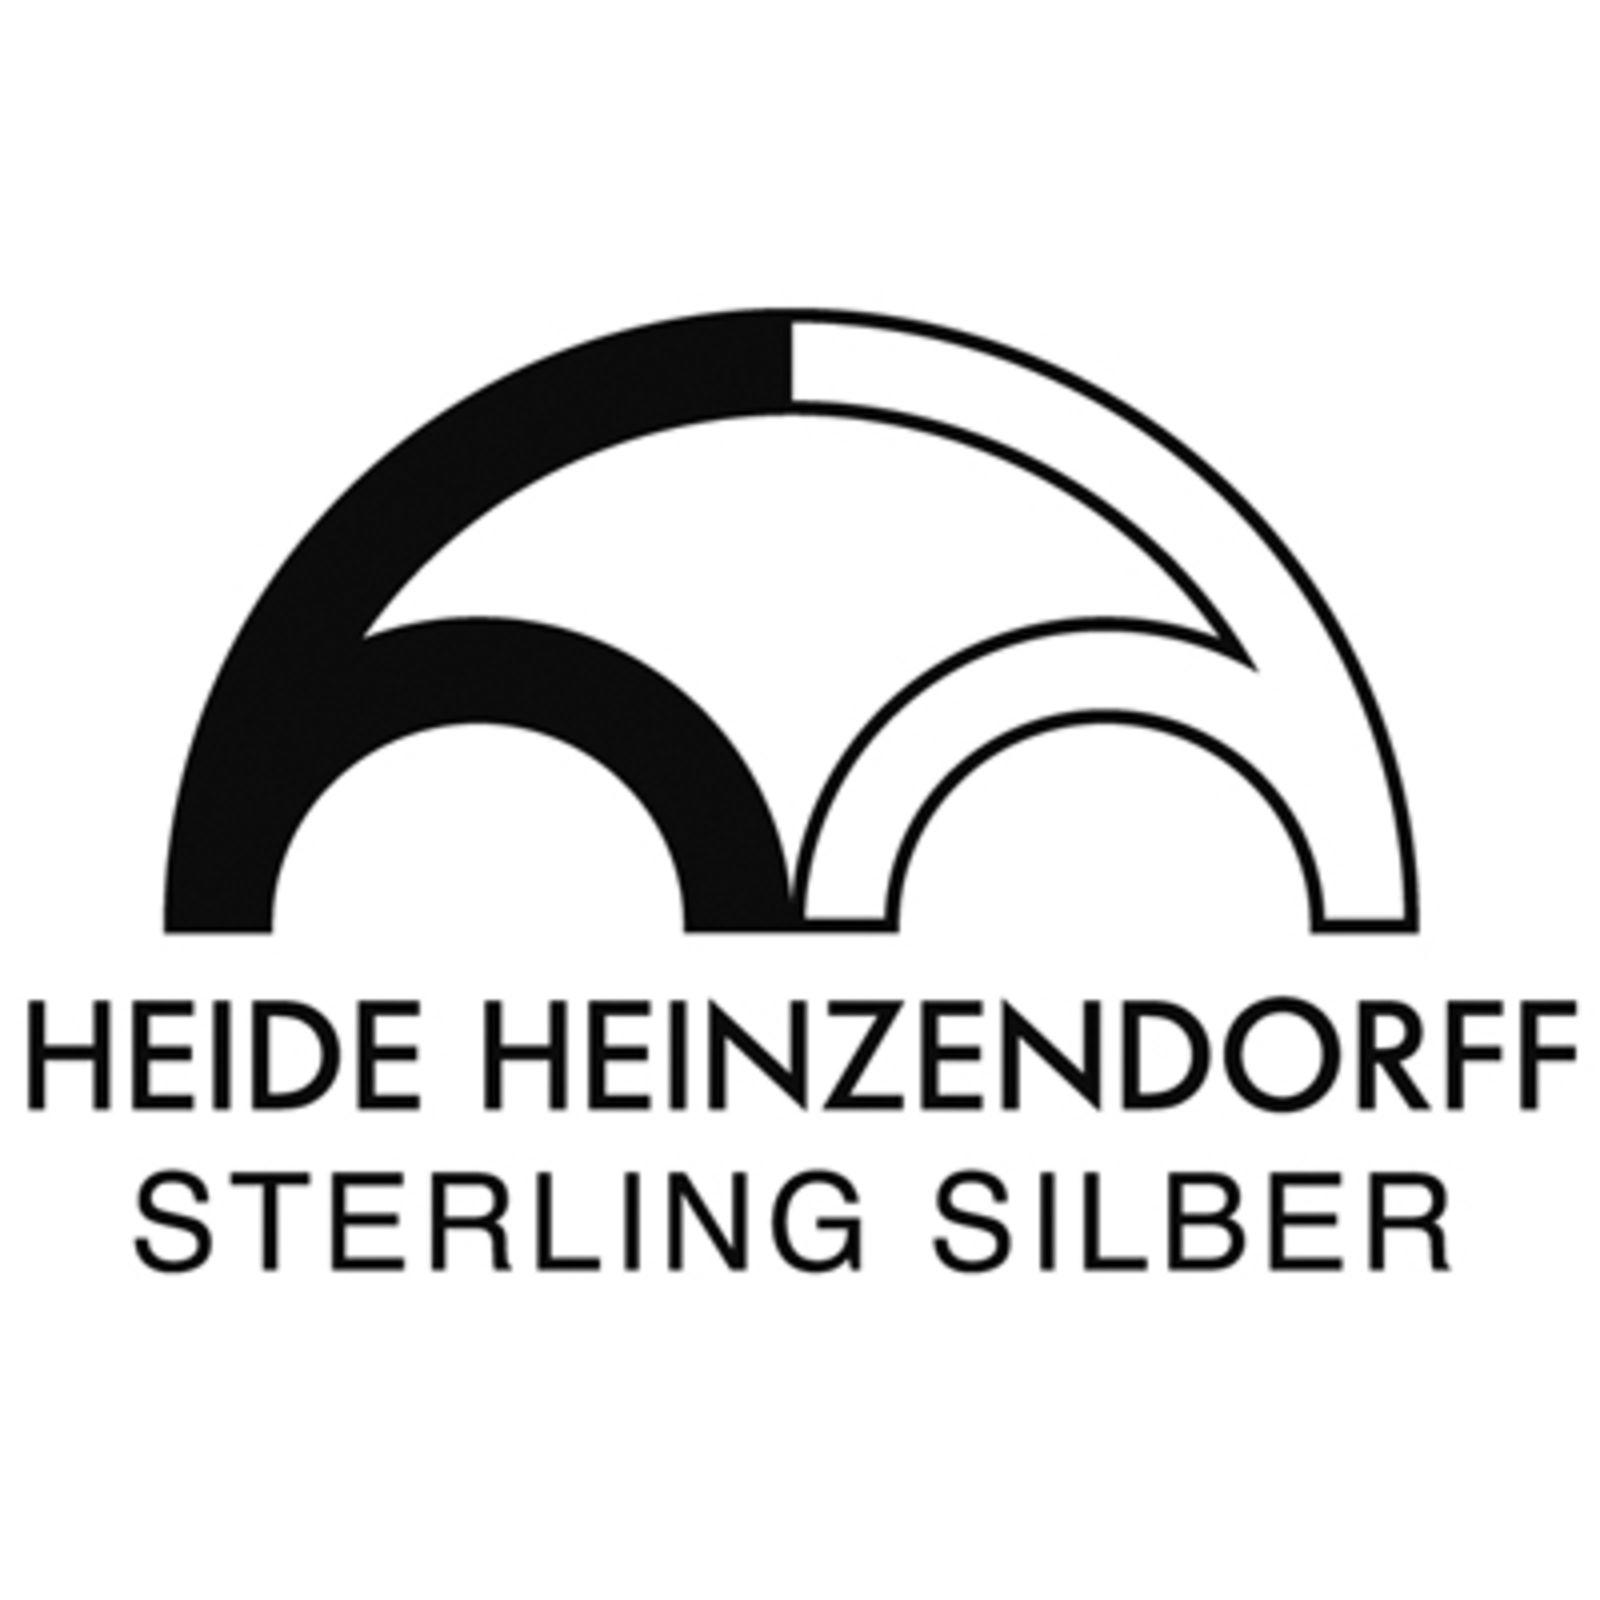 HEIDE HEINZENDORFF (Bild 1)